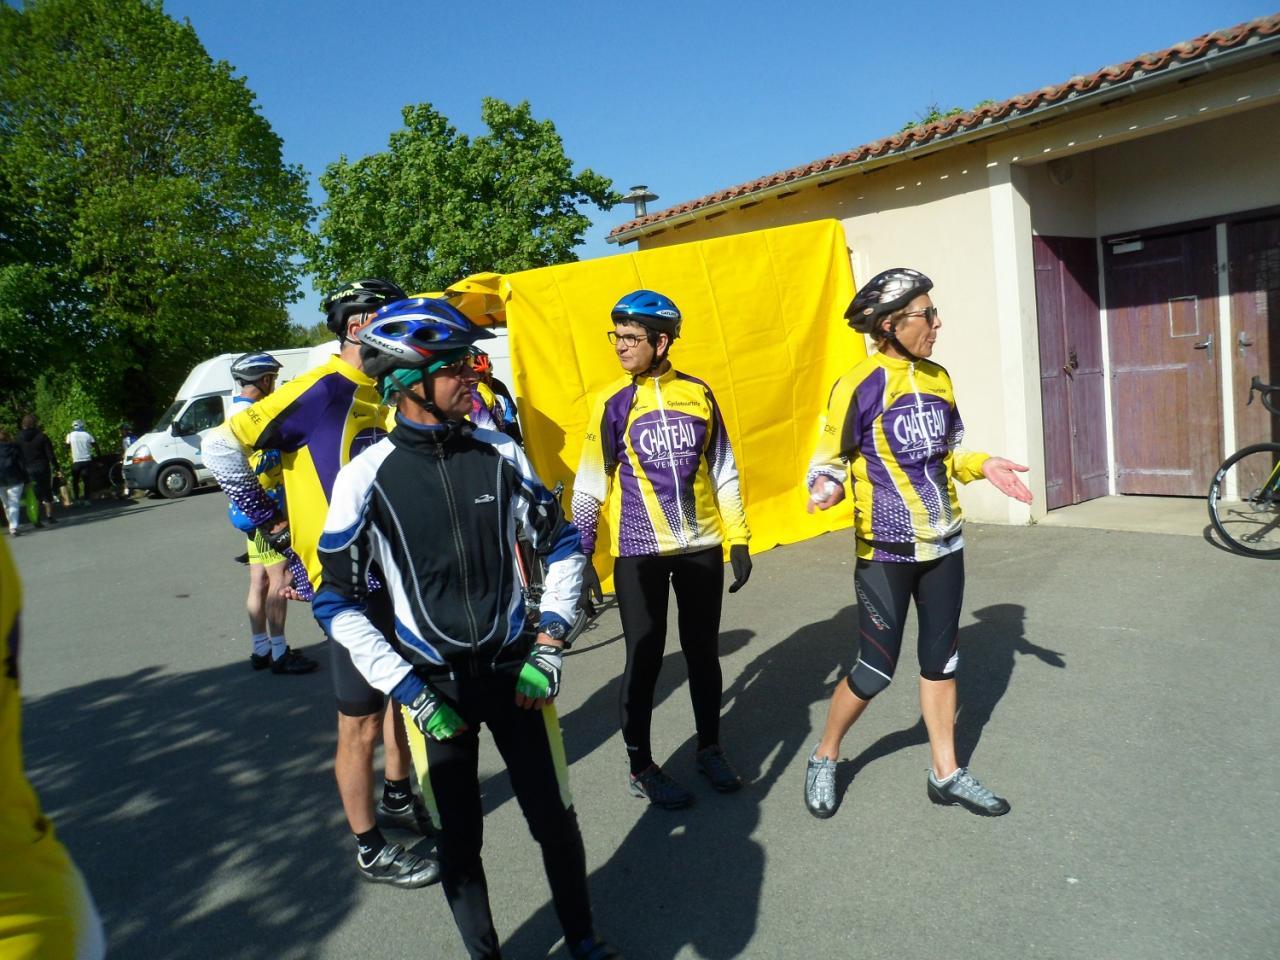 20170423_Ravitaillement Cyclo de Saligny_76